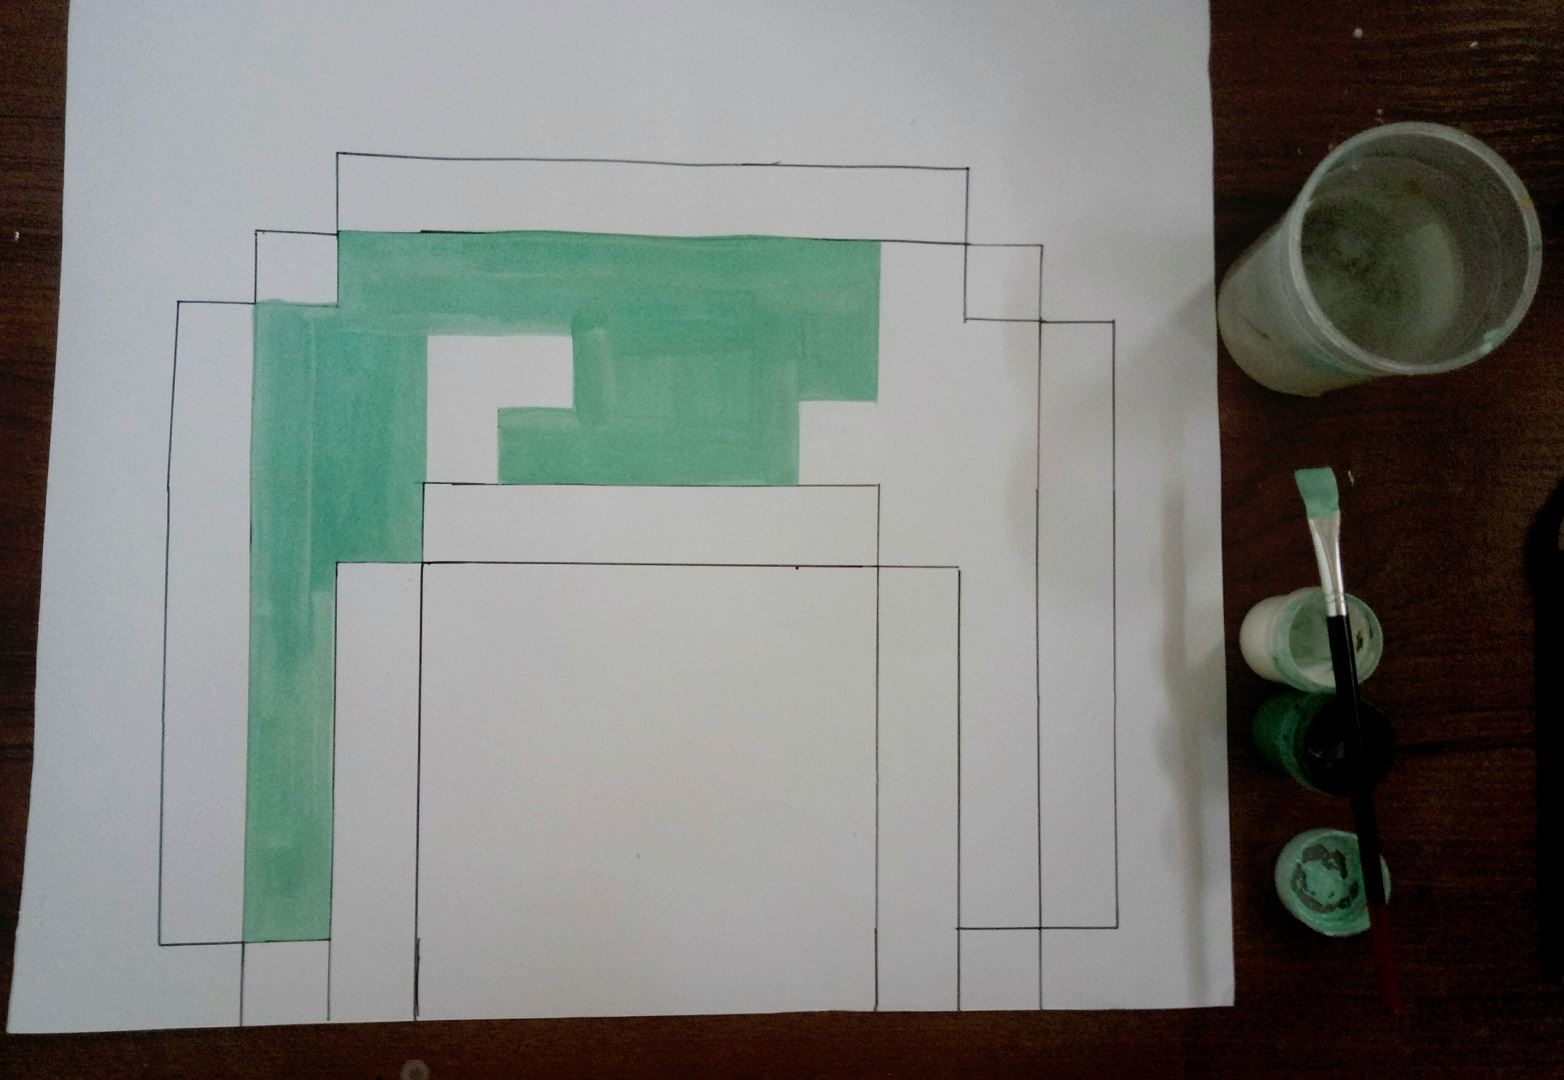 Берём в руки светло-зелёную краску и рисуем одну сторону